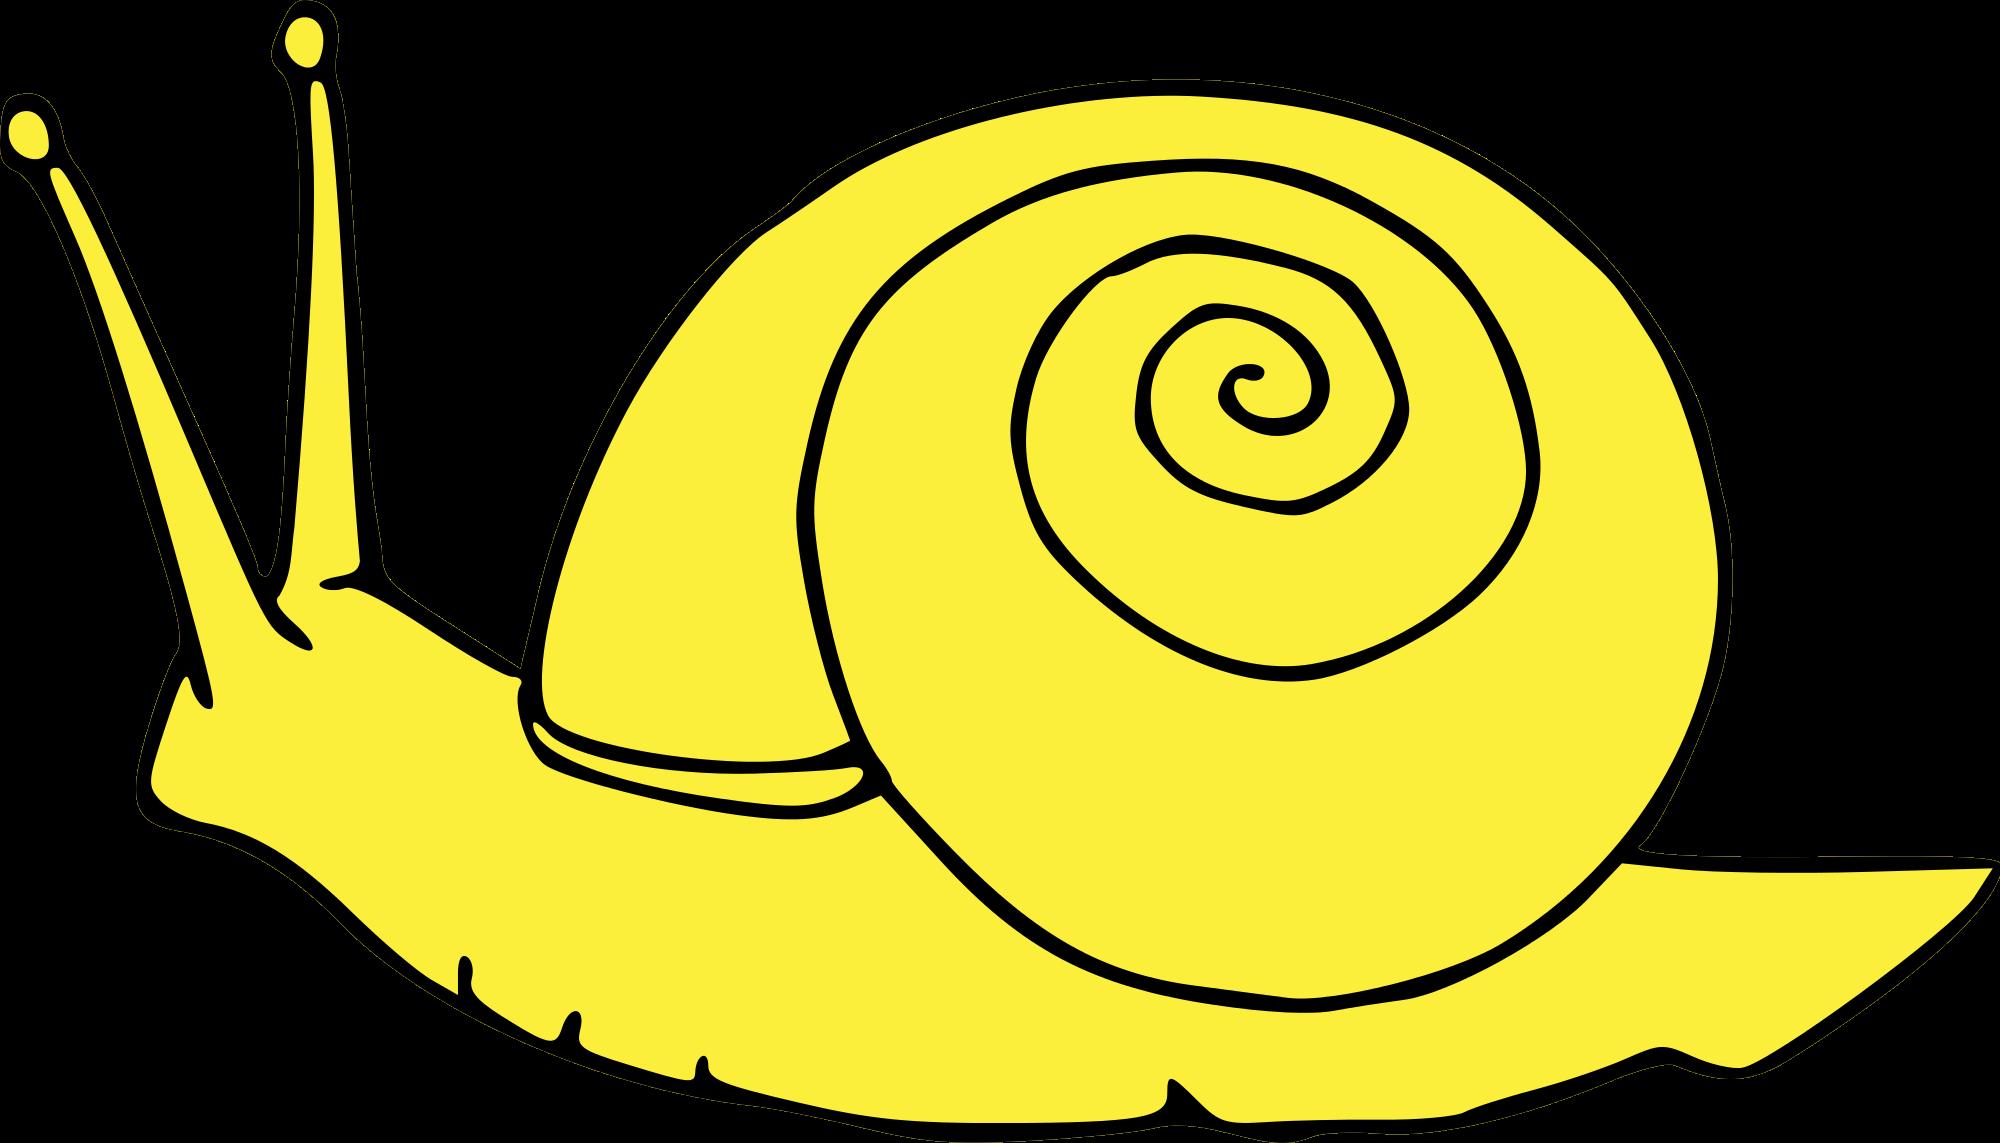 image freeuse download snail clipart escargot #83436023